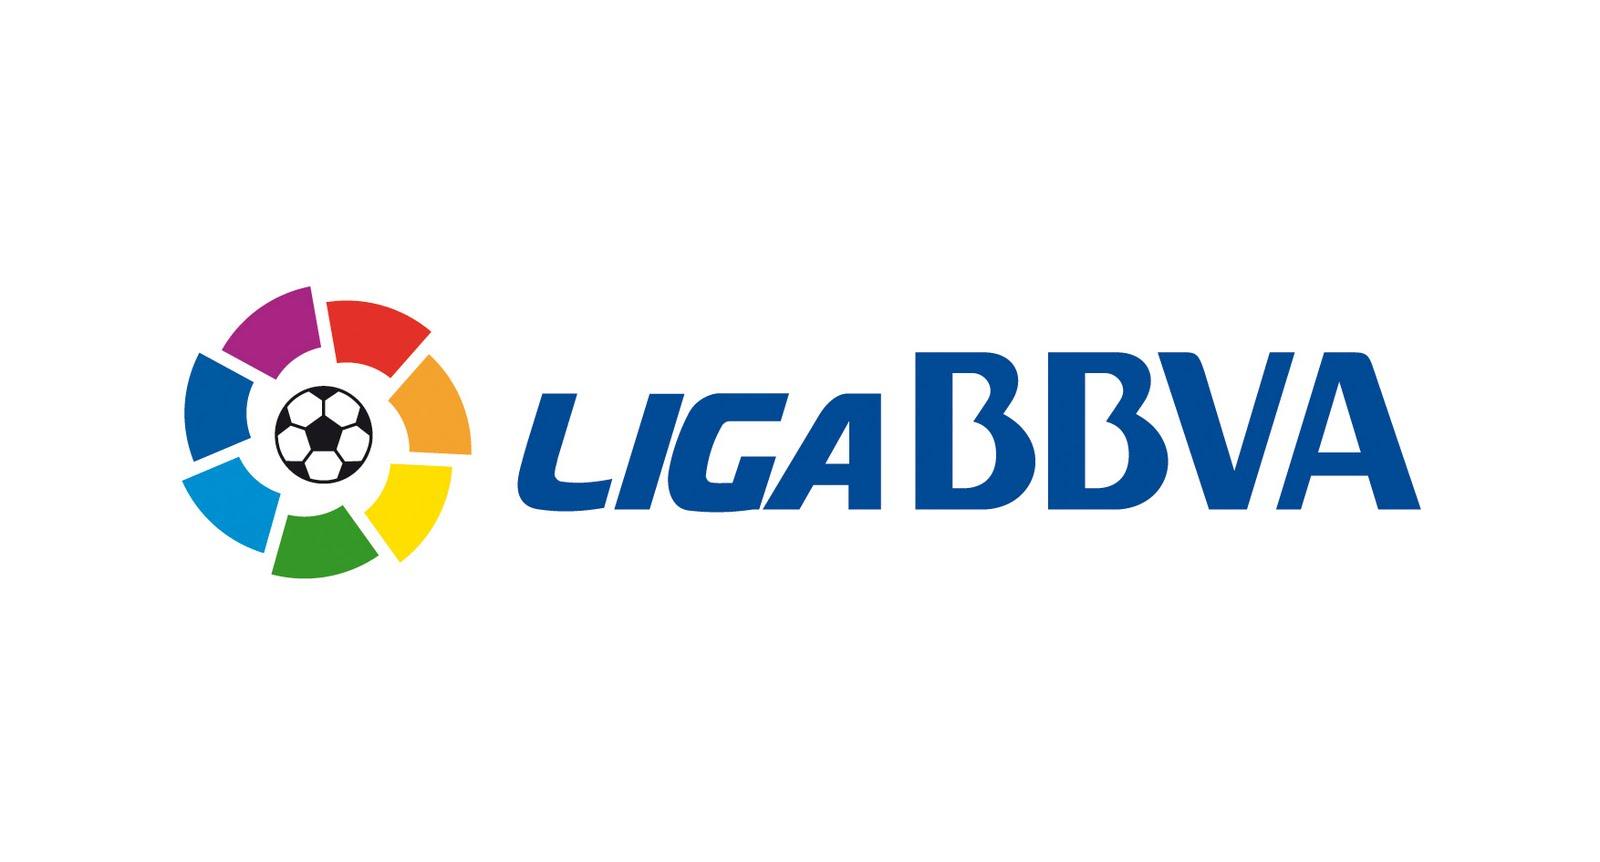 Liga saison 2015-2016 : ça démarre  le 15 août